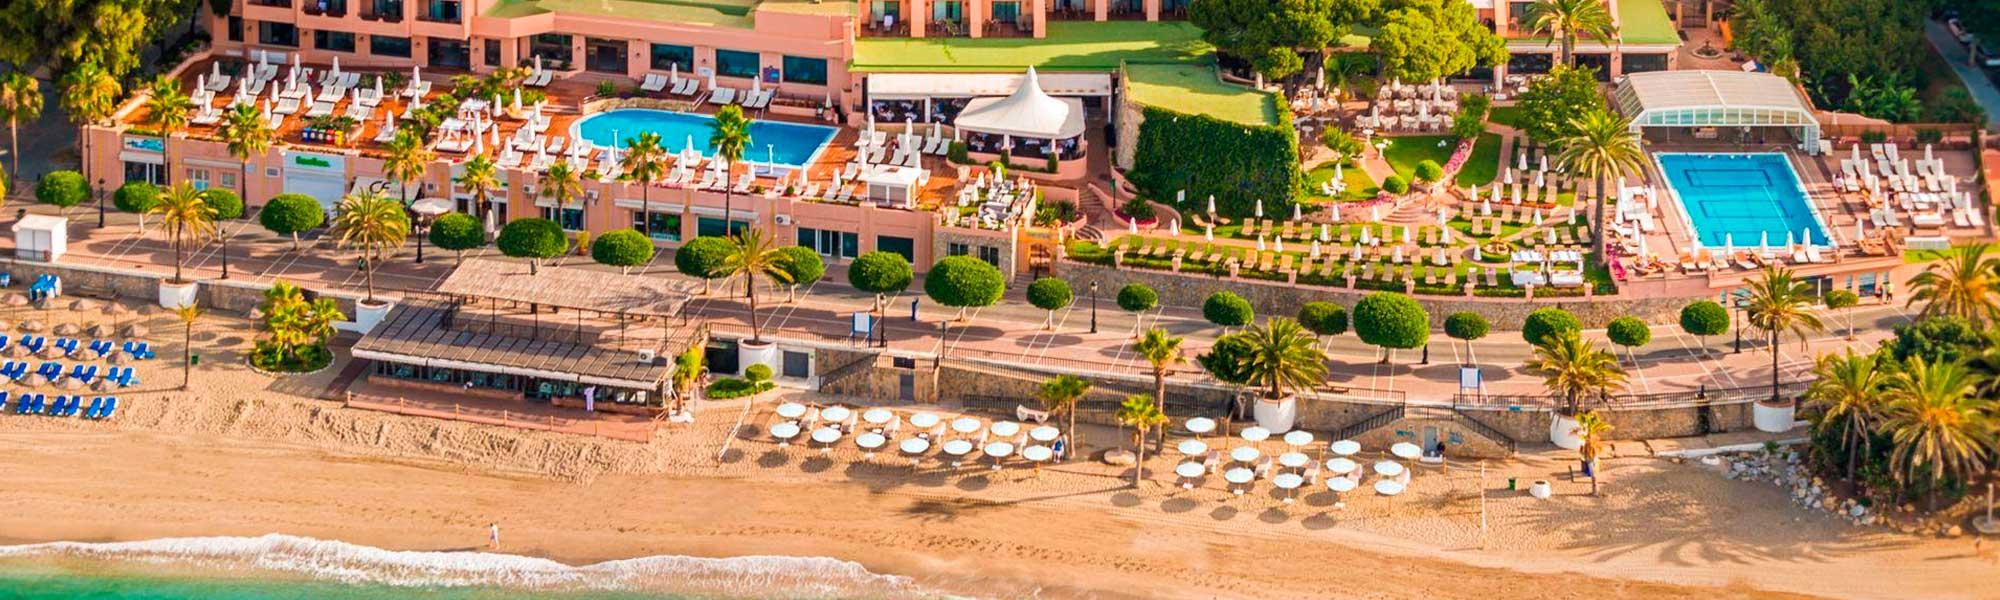 Sterne Hotel Marbella